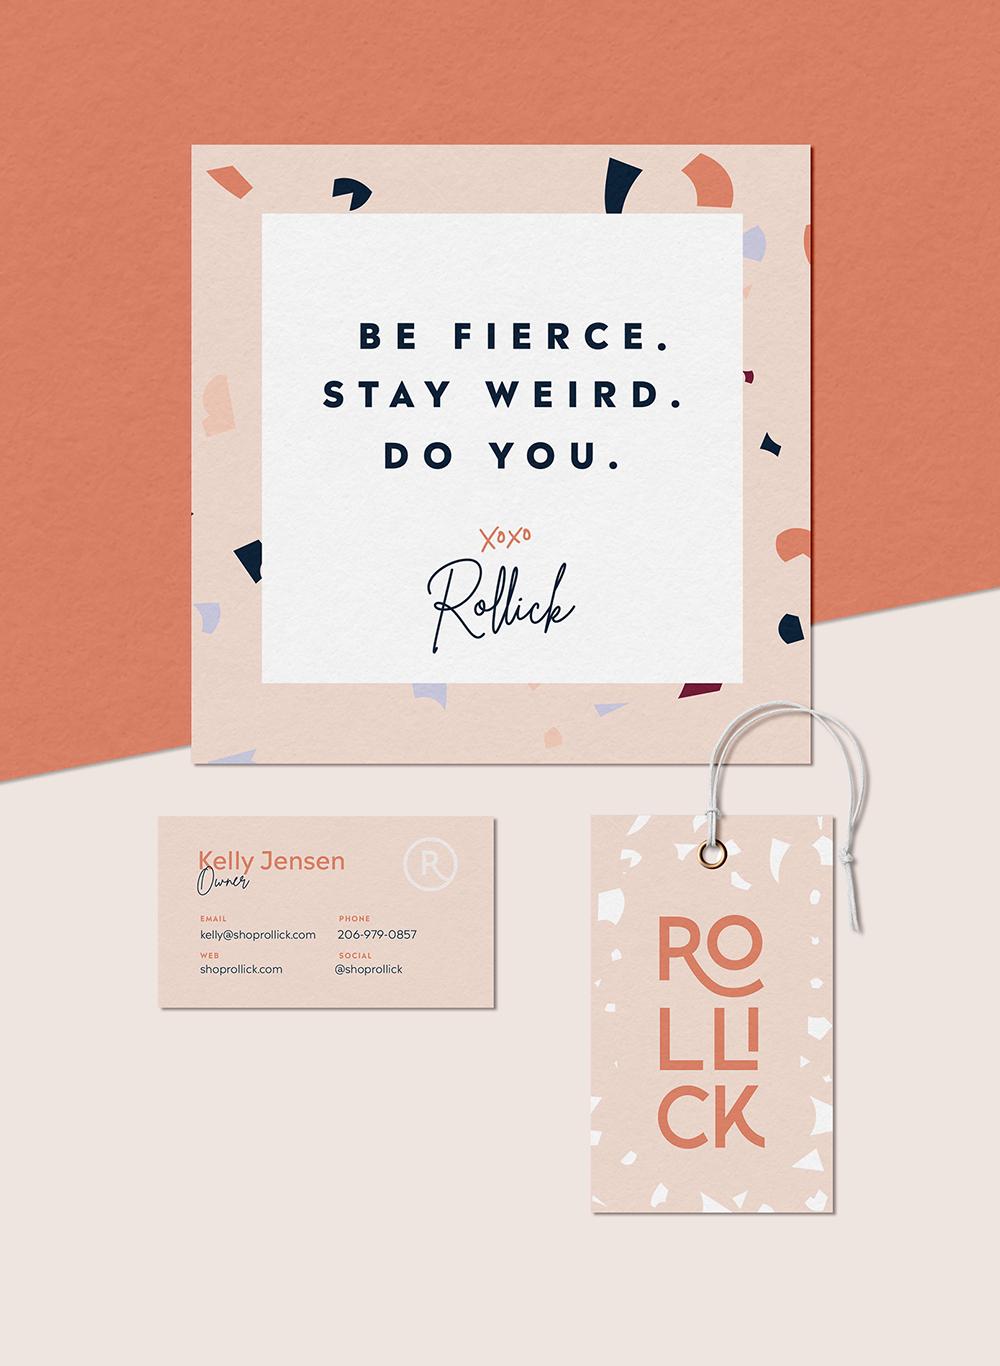 Rollick - Brand Design